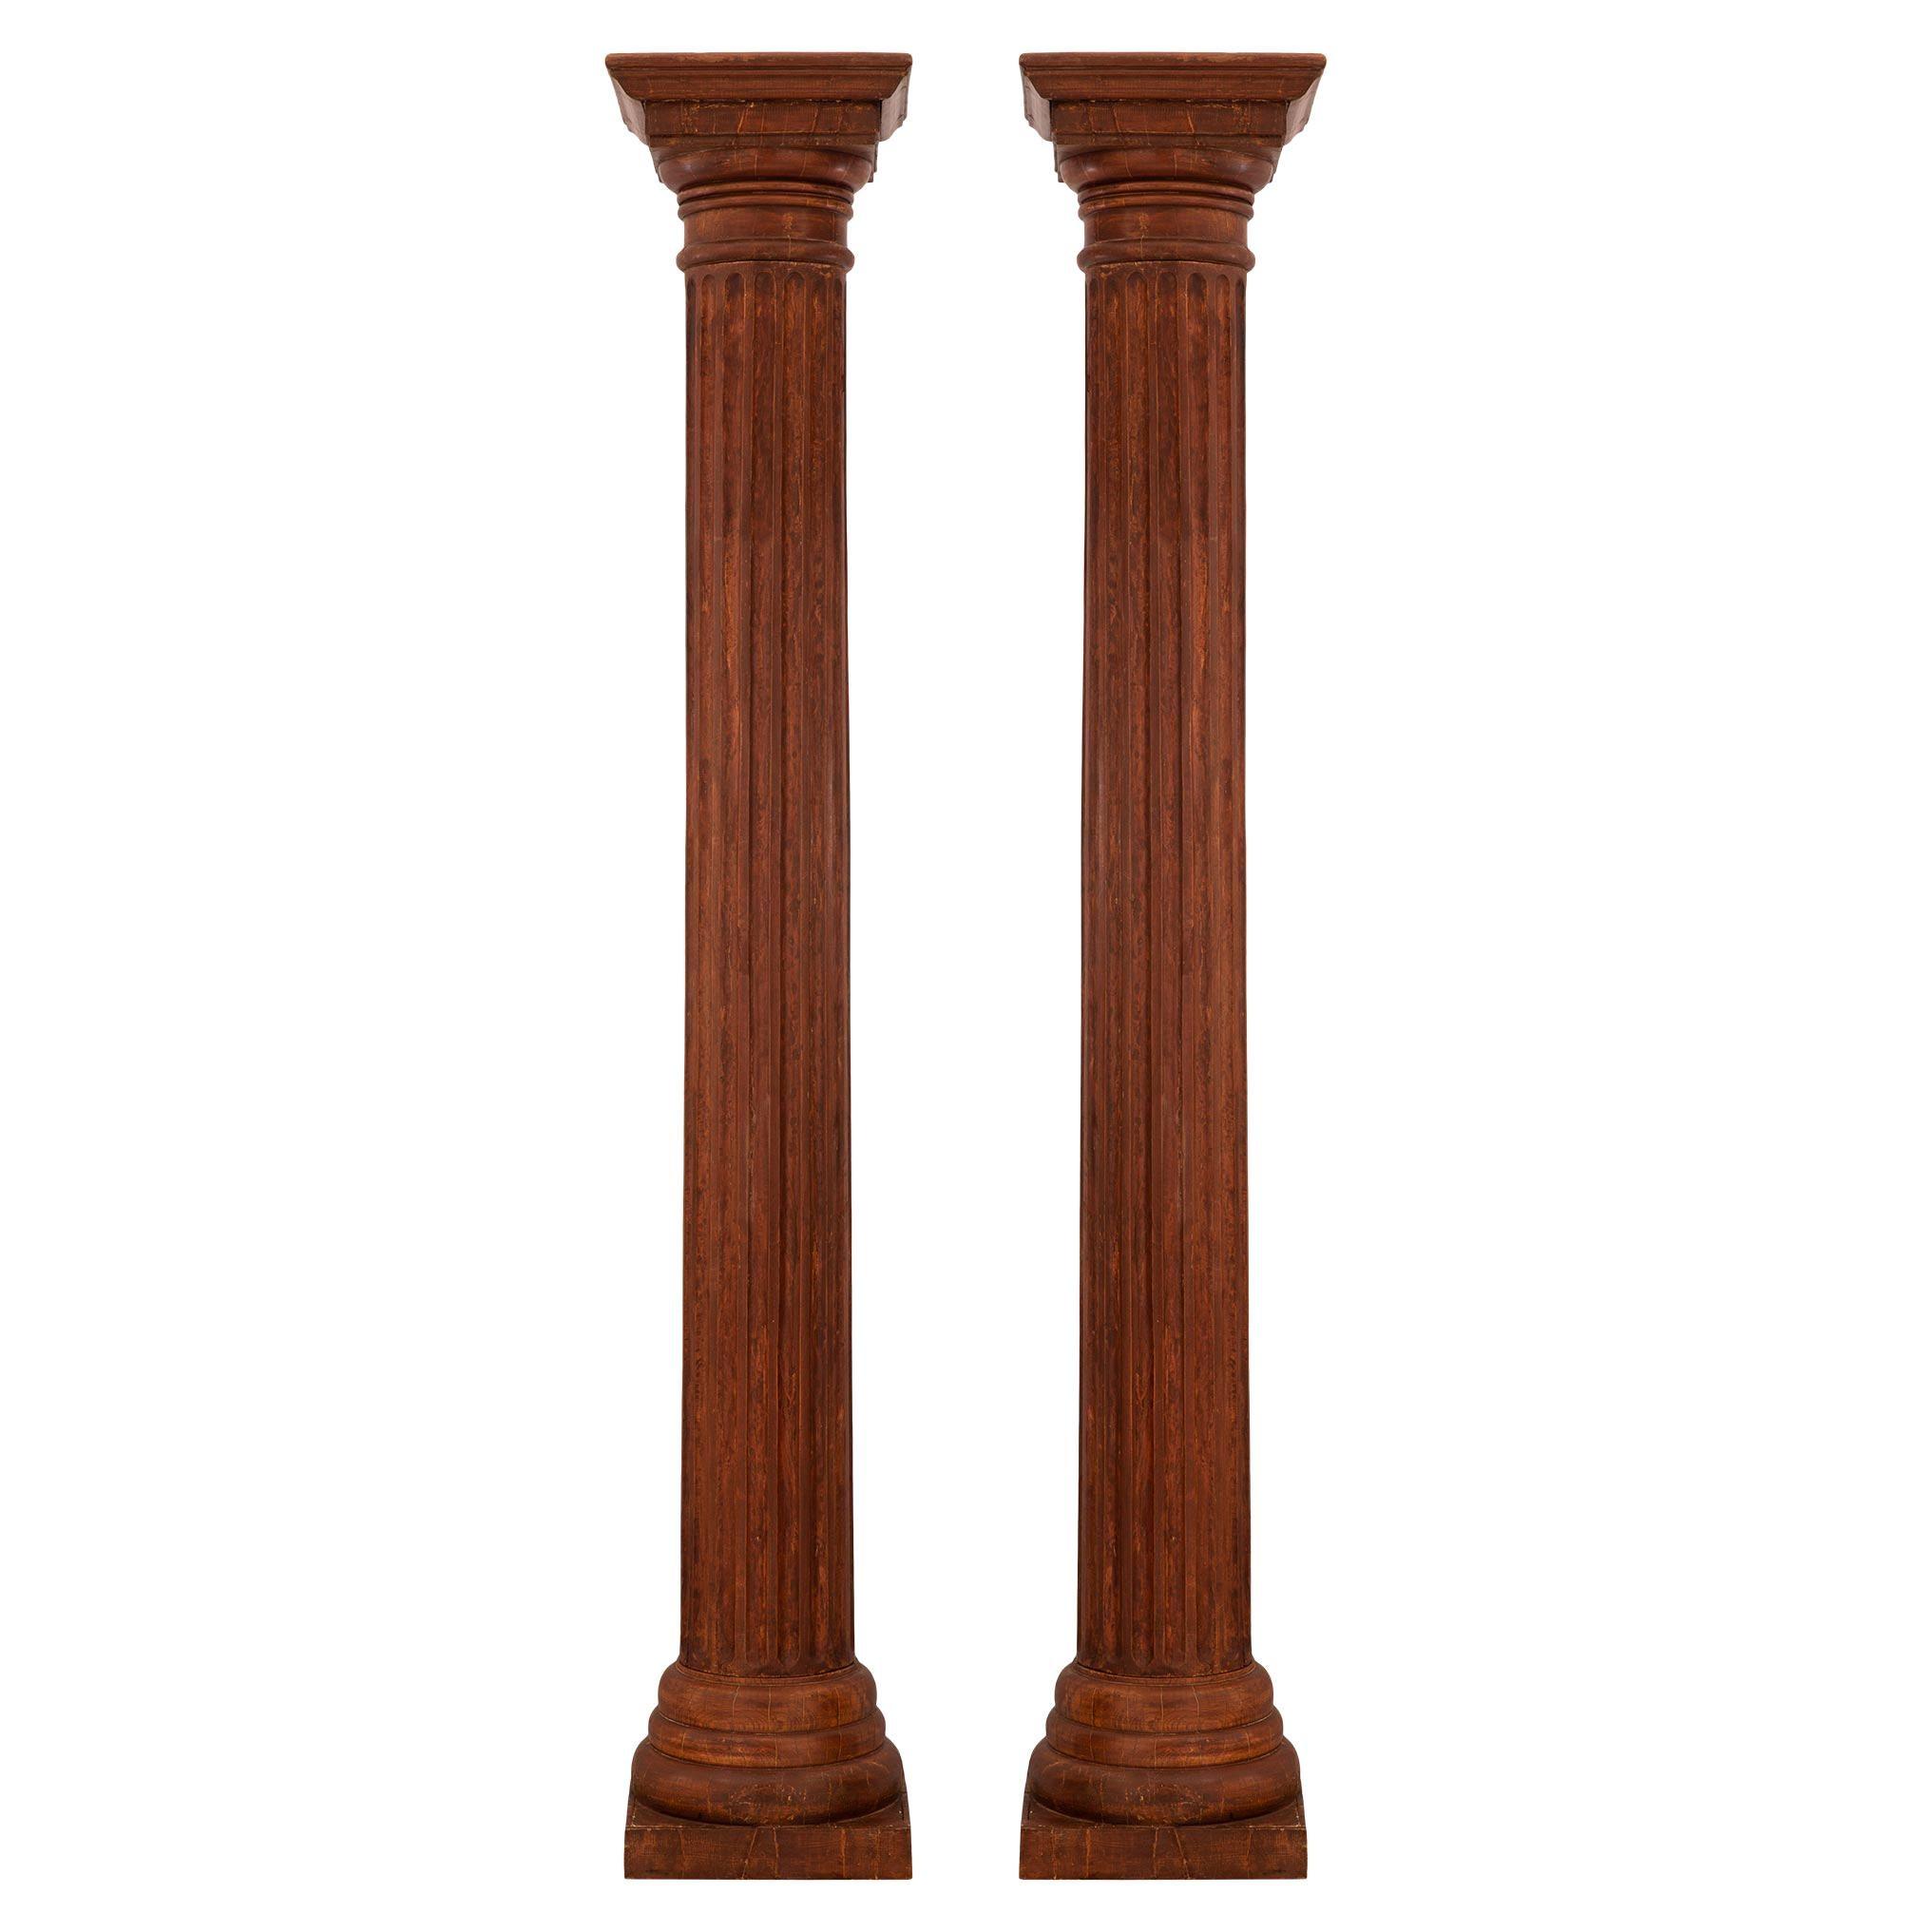 Pair of Italian 19th Century Architectural Wood Columns